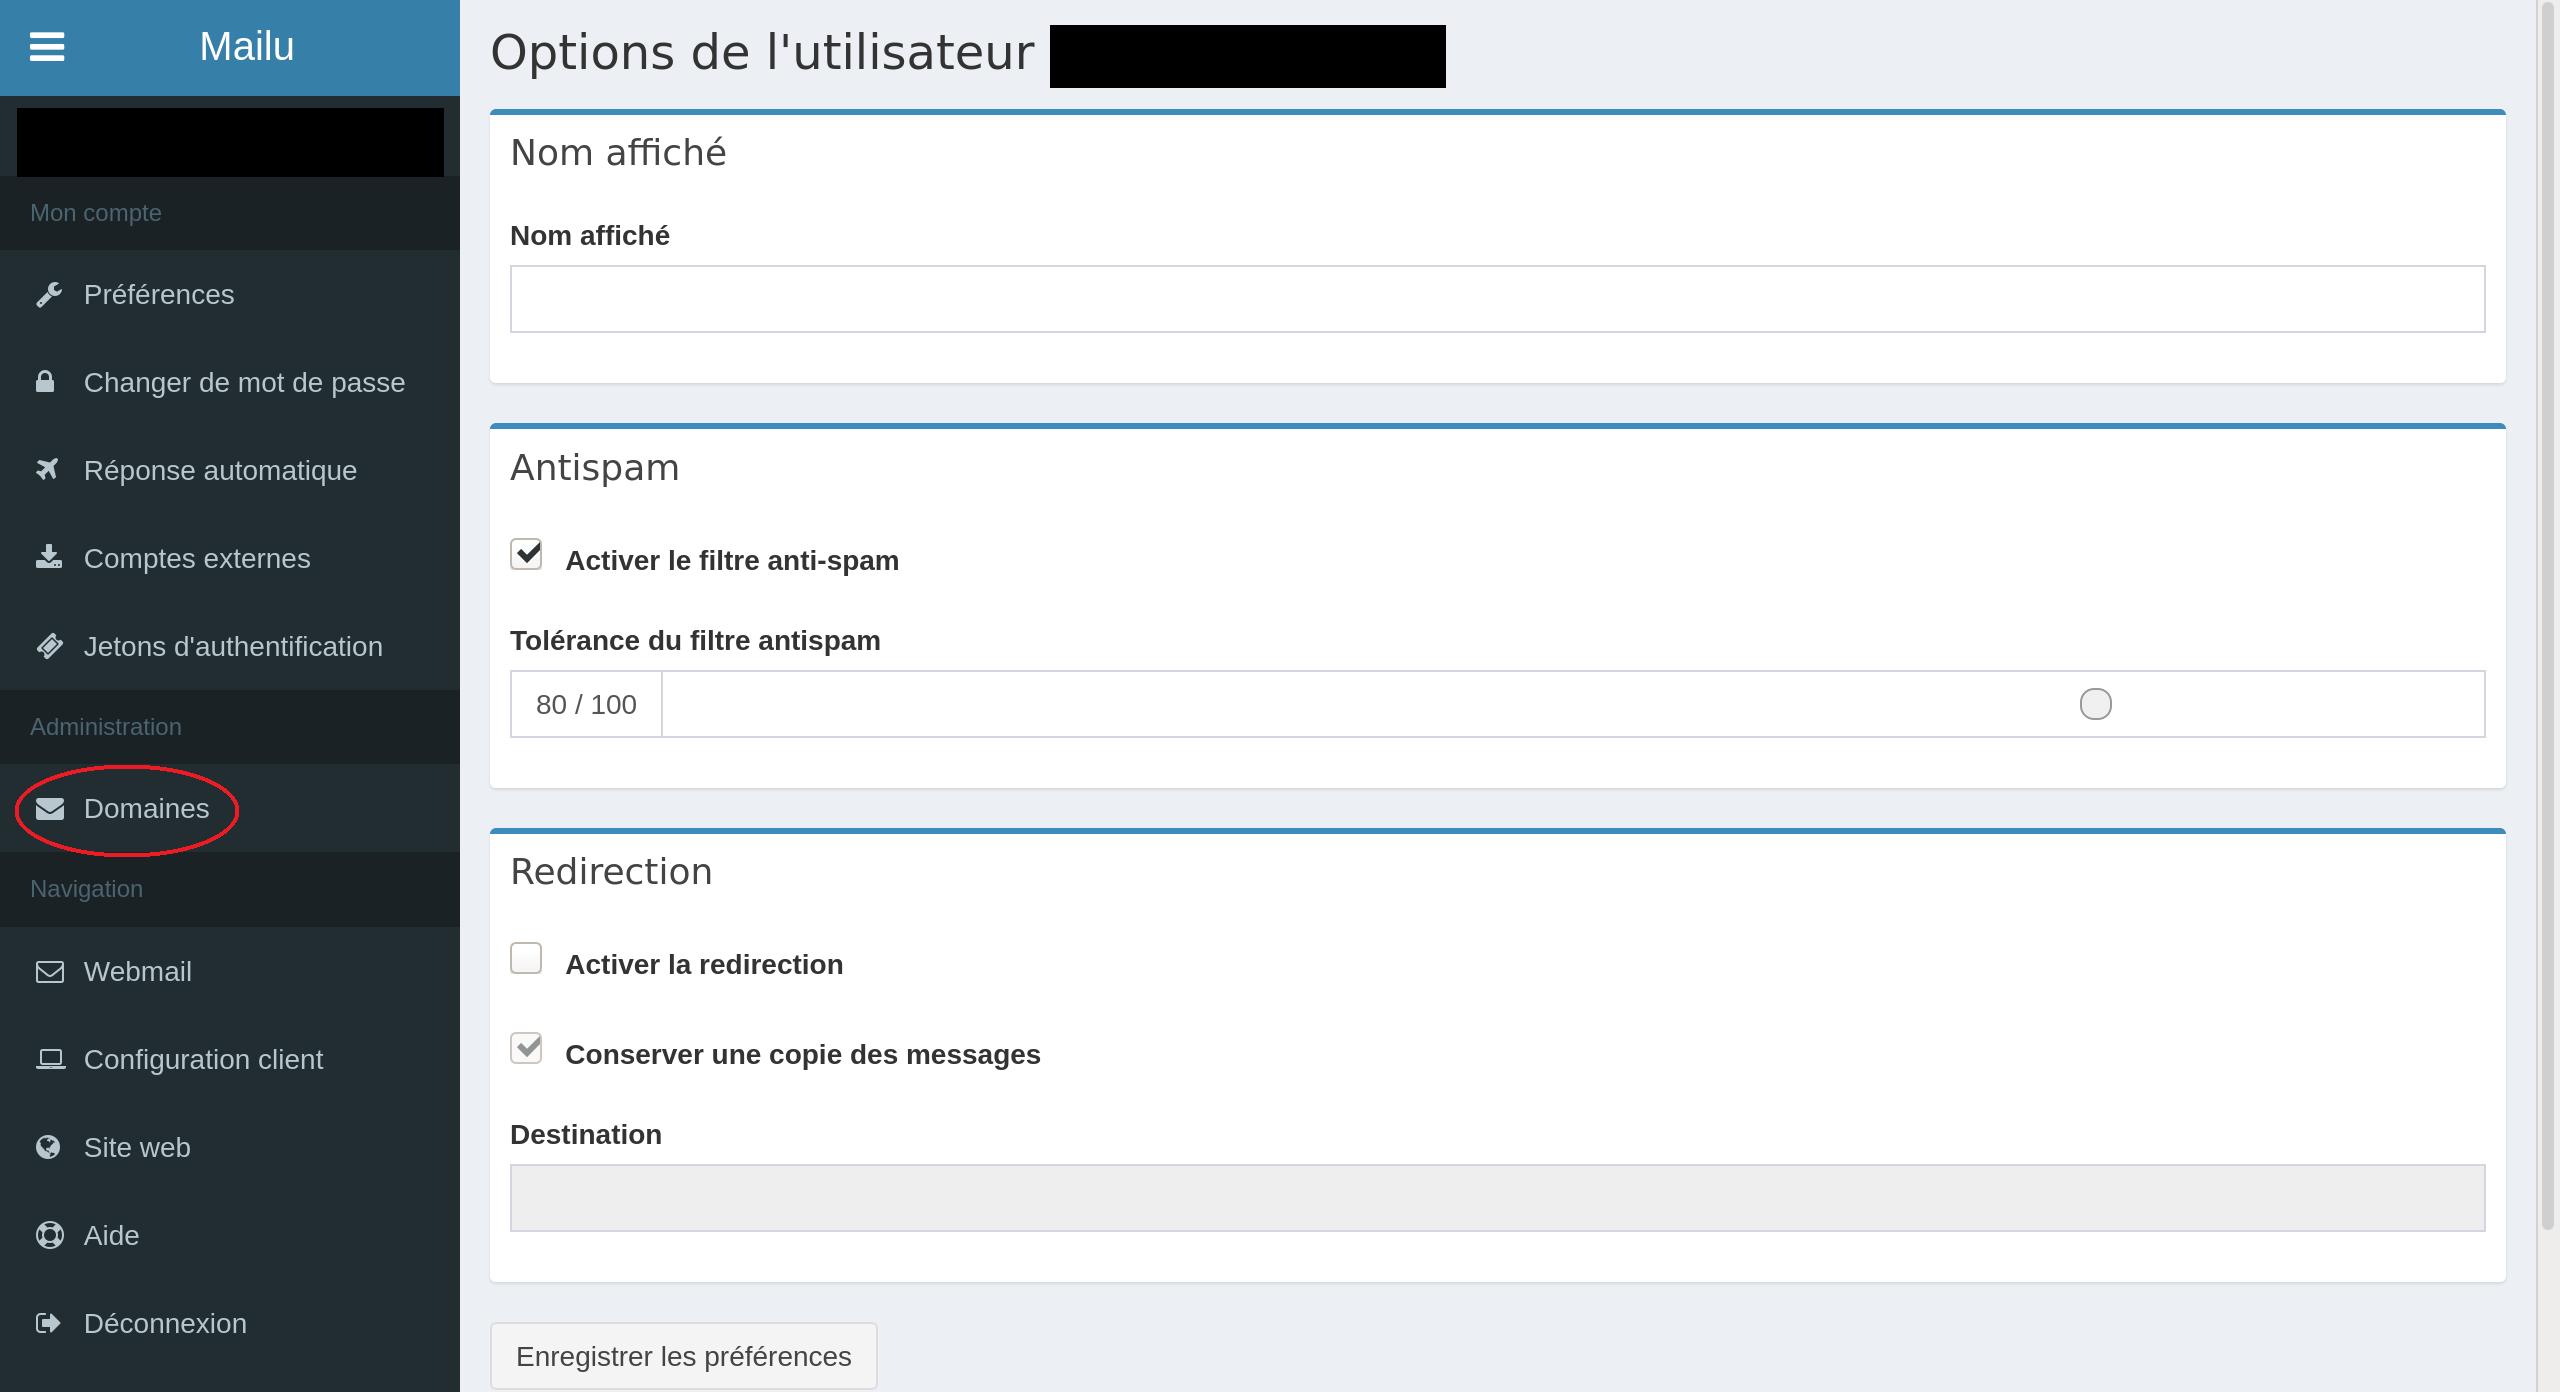 content/service/mailu/images/domain1.png